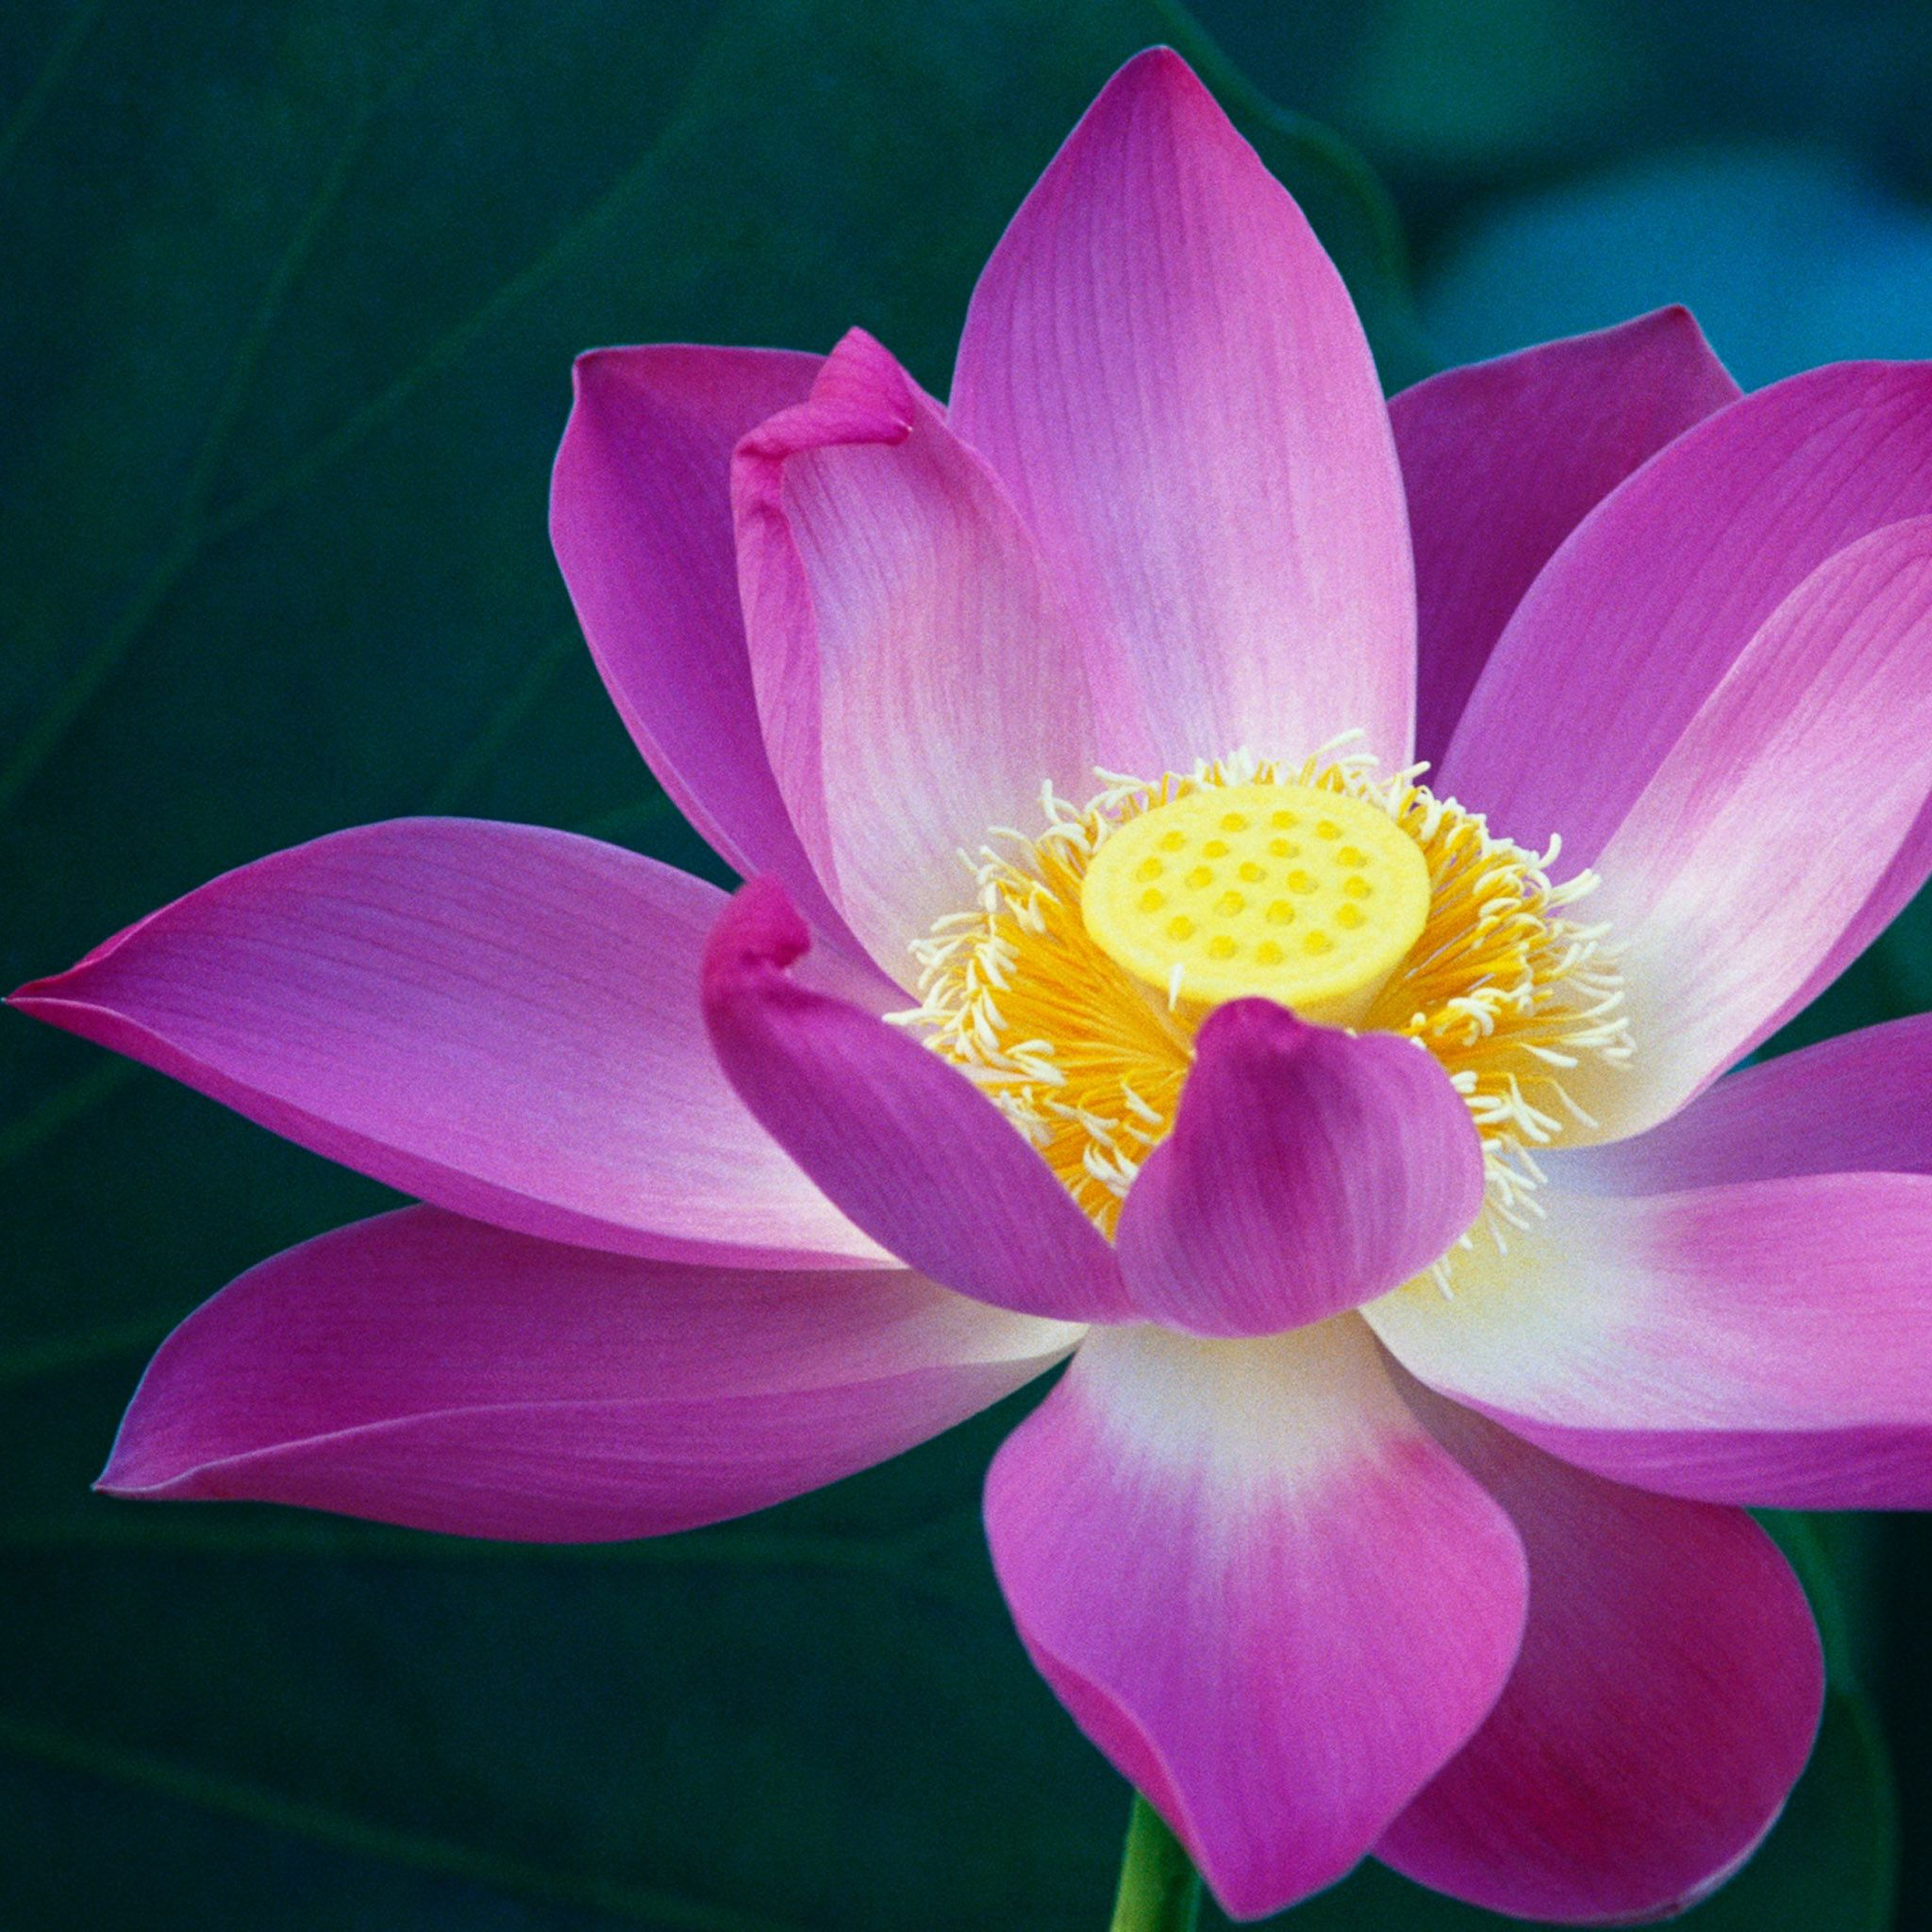 Lotus flower bomb free download images flower wallpaper hd wale lotus flower bomb download image collections flower wallpaper hd lotus flower bomb free download images izmirmasajfo